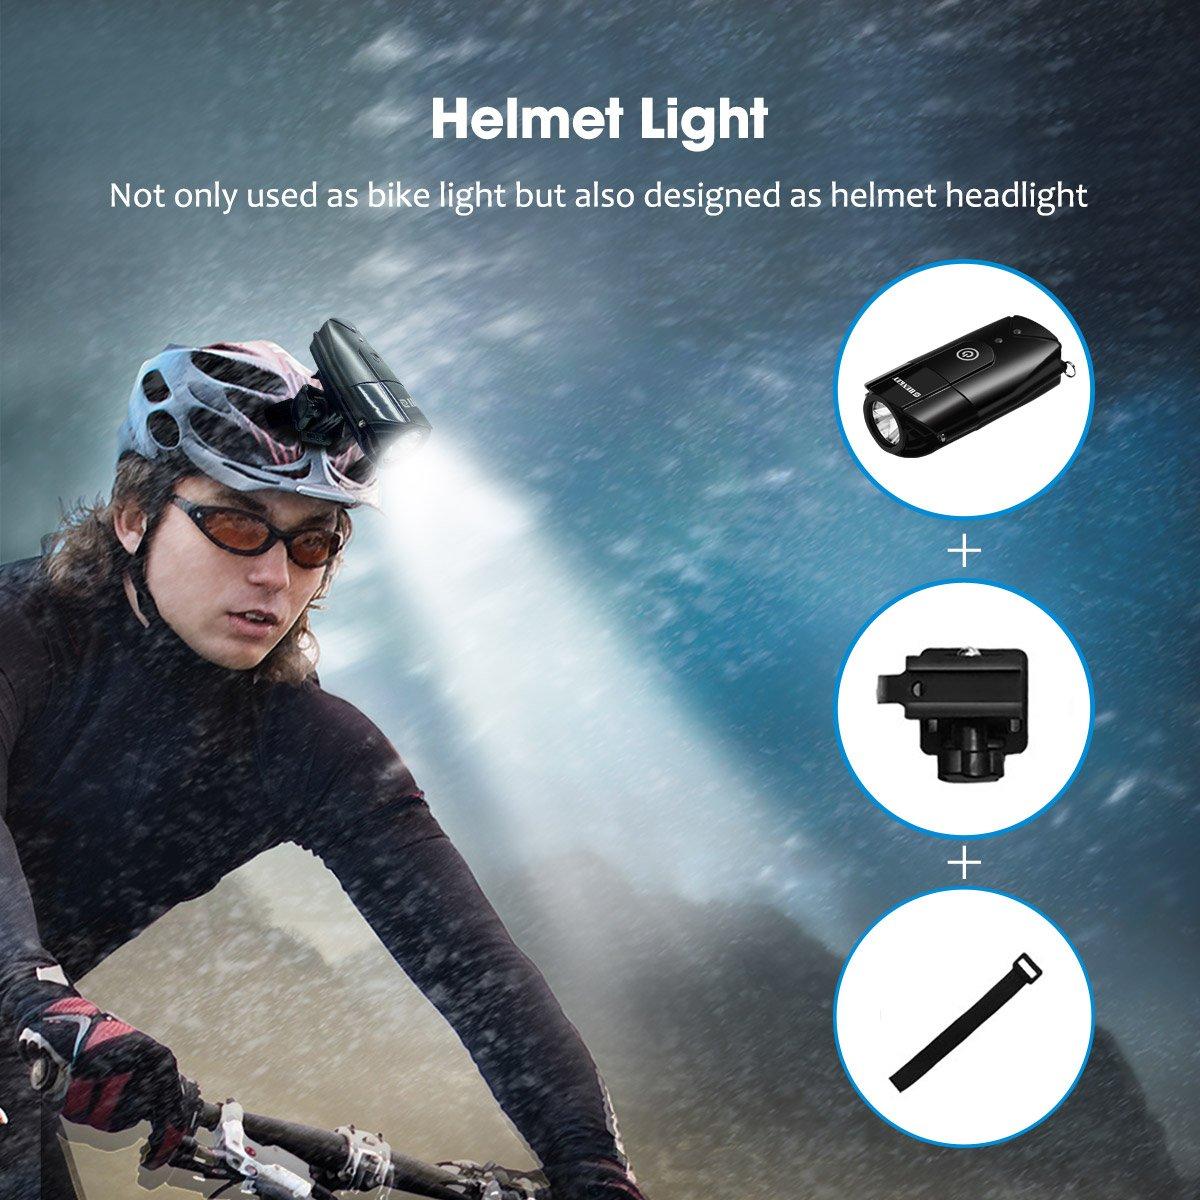 Super Bright Waterproof Light for Bike Bicycle Light 2000mAh//1000 Lumen LED Bike Headlight USB Rechargeable Flashlight for Mountain /& Kids /& Street Bicycle